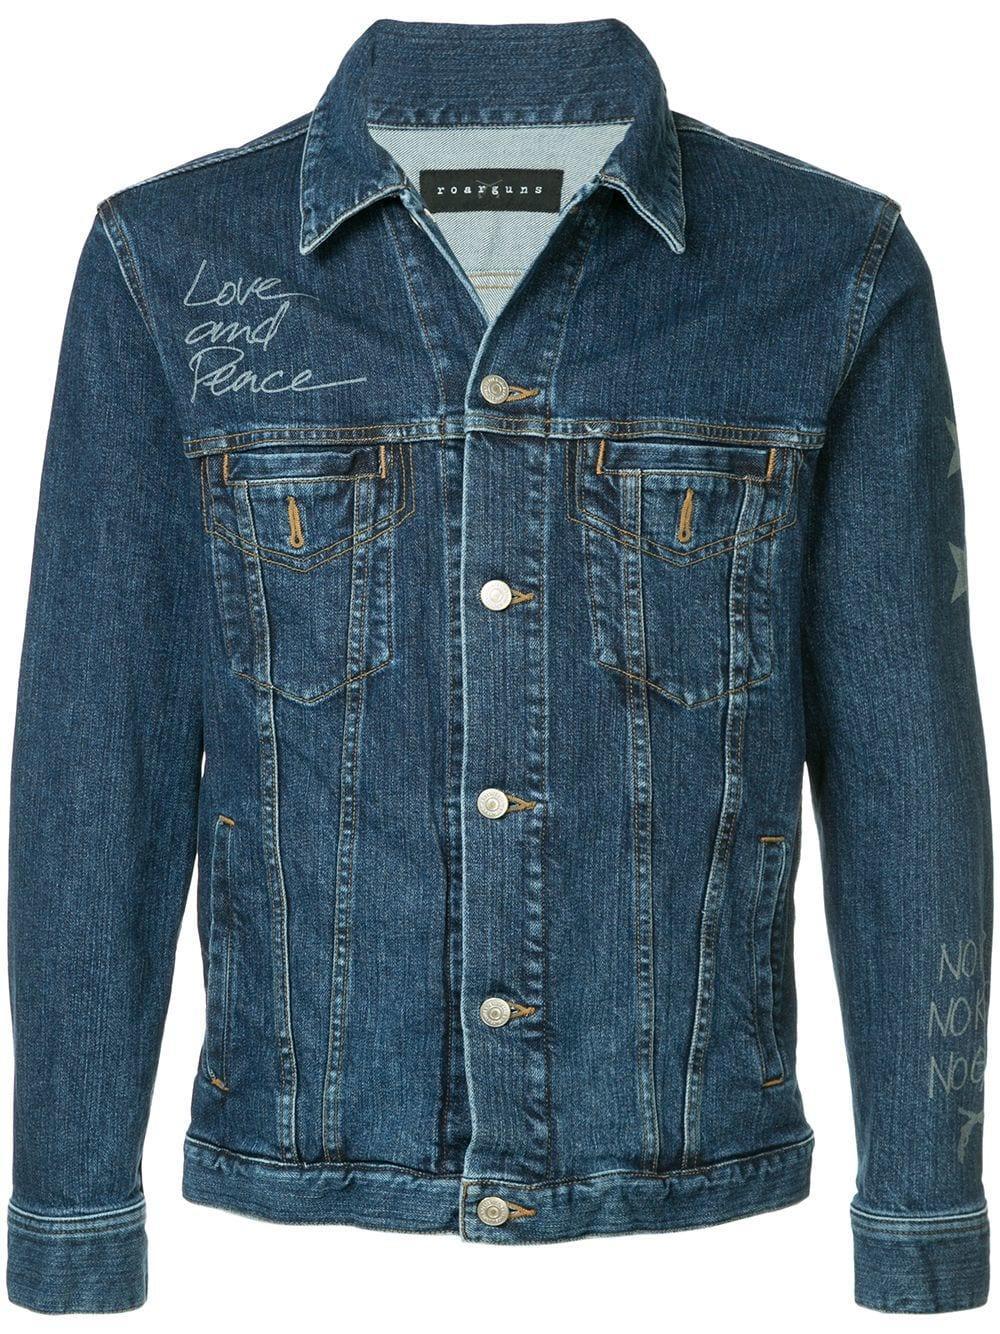 Roarguns Classic Denim Jacket - Blue